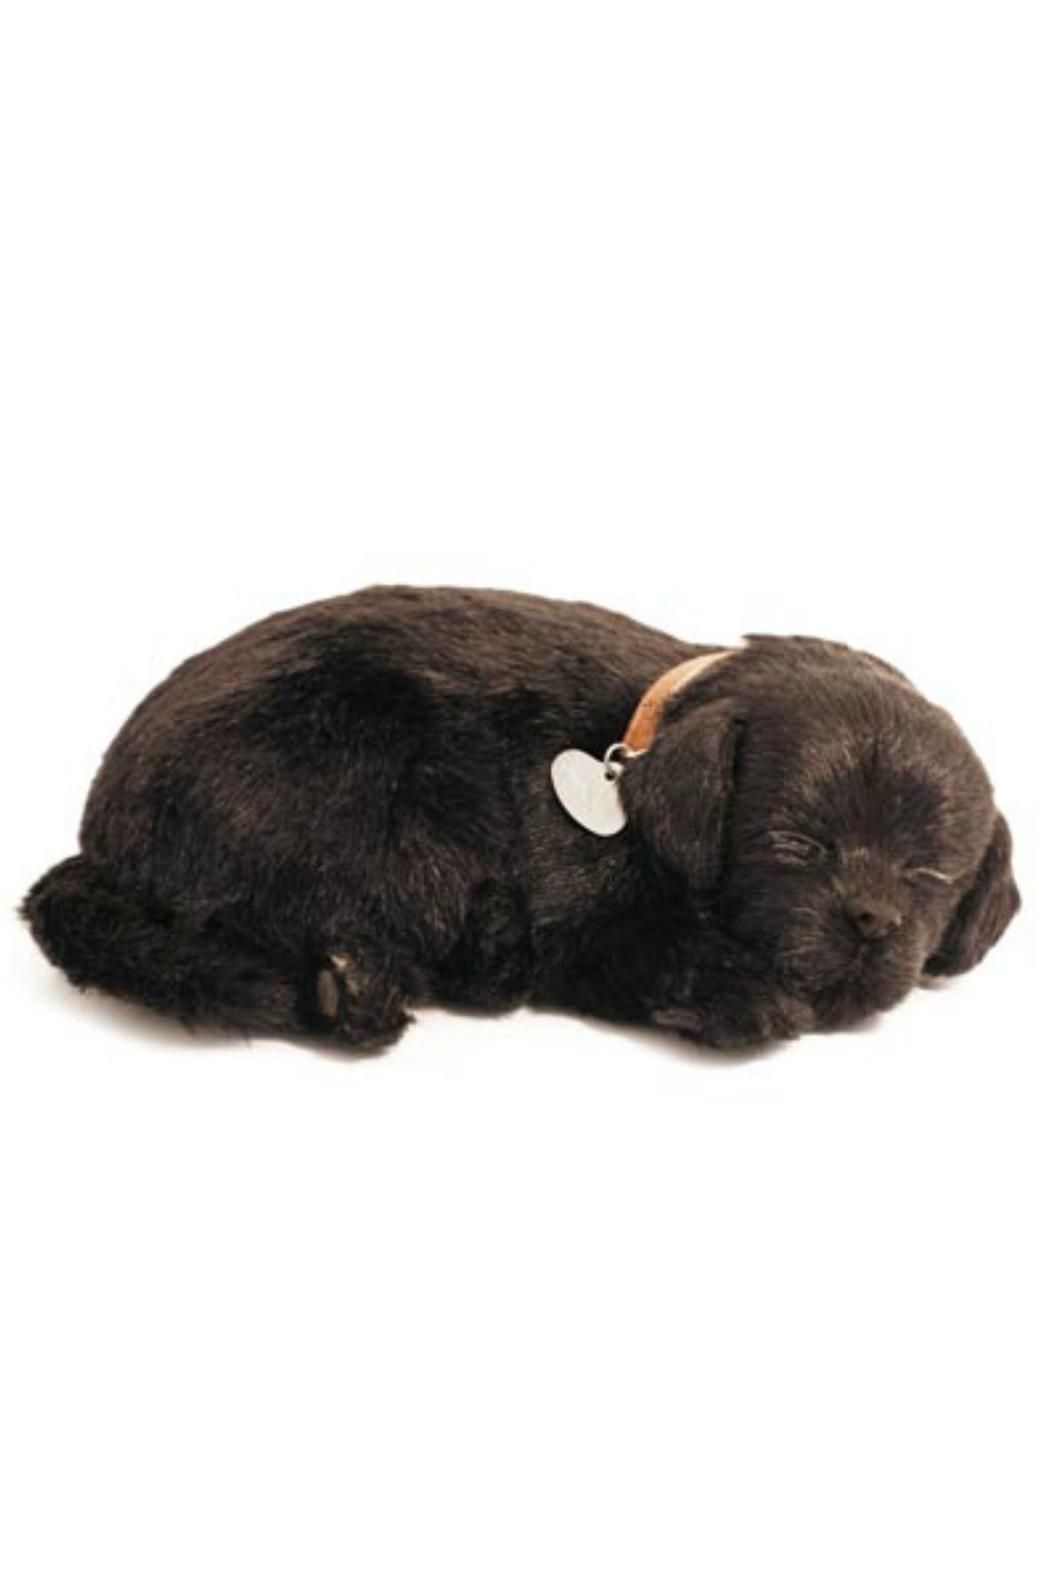 Sleeping Labrador Toy Black Lab Puppies Black Lab Lab Puppies